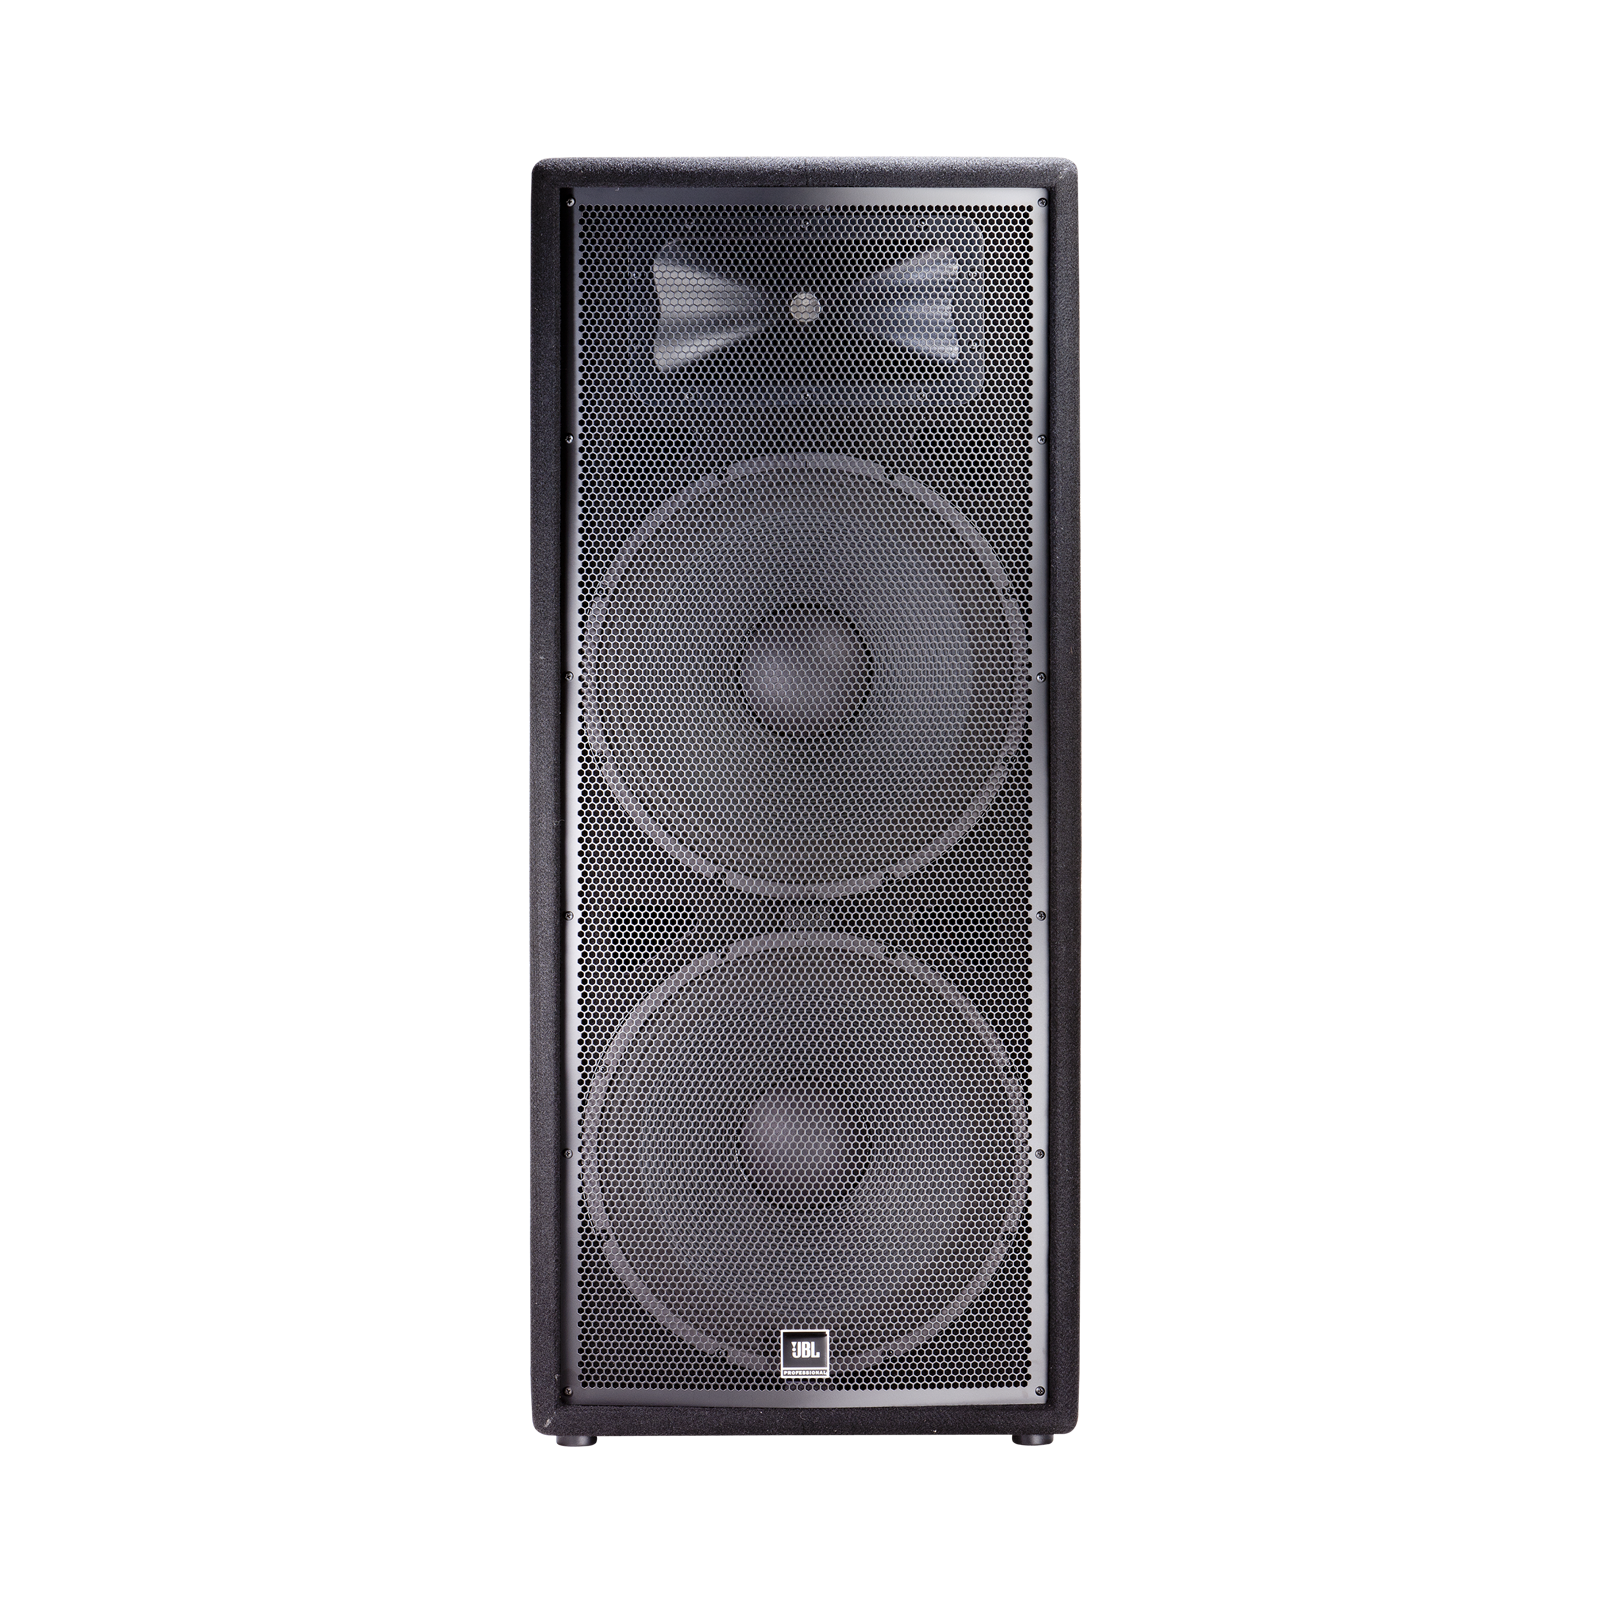 "JBL JRX225 - Black - Dual 15"" Two-Way Sound Reinforcement Loudspeaker System - Front"